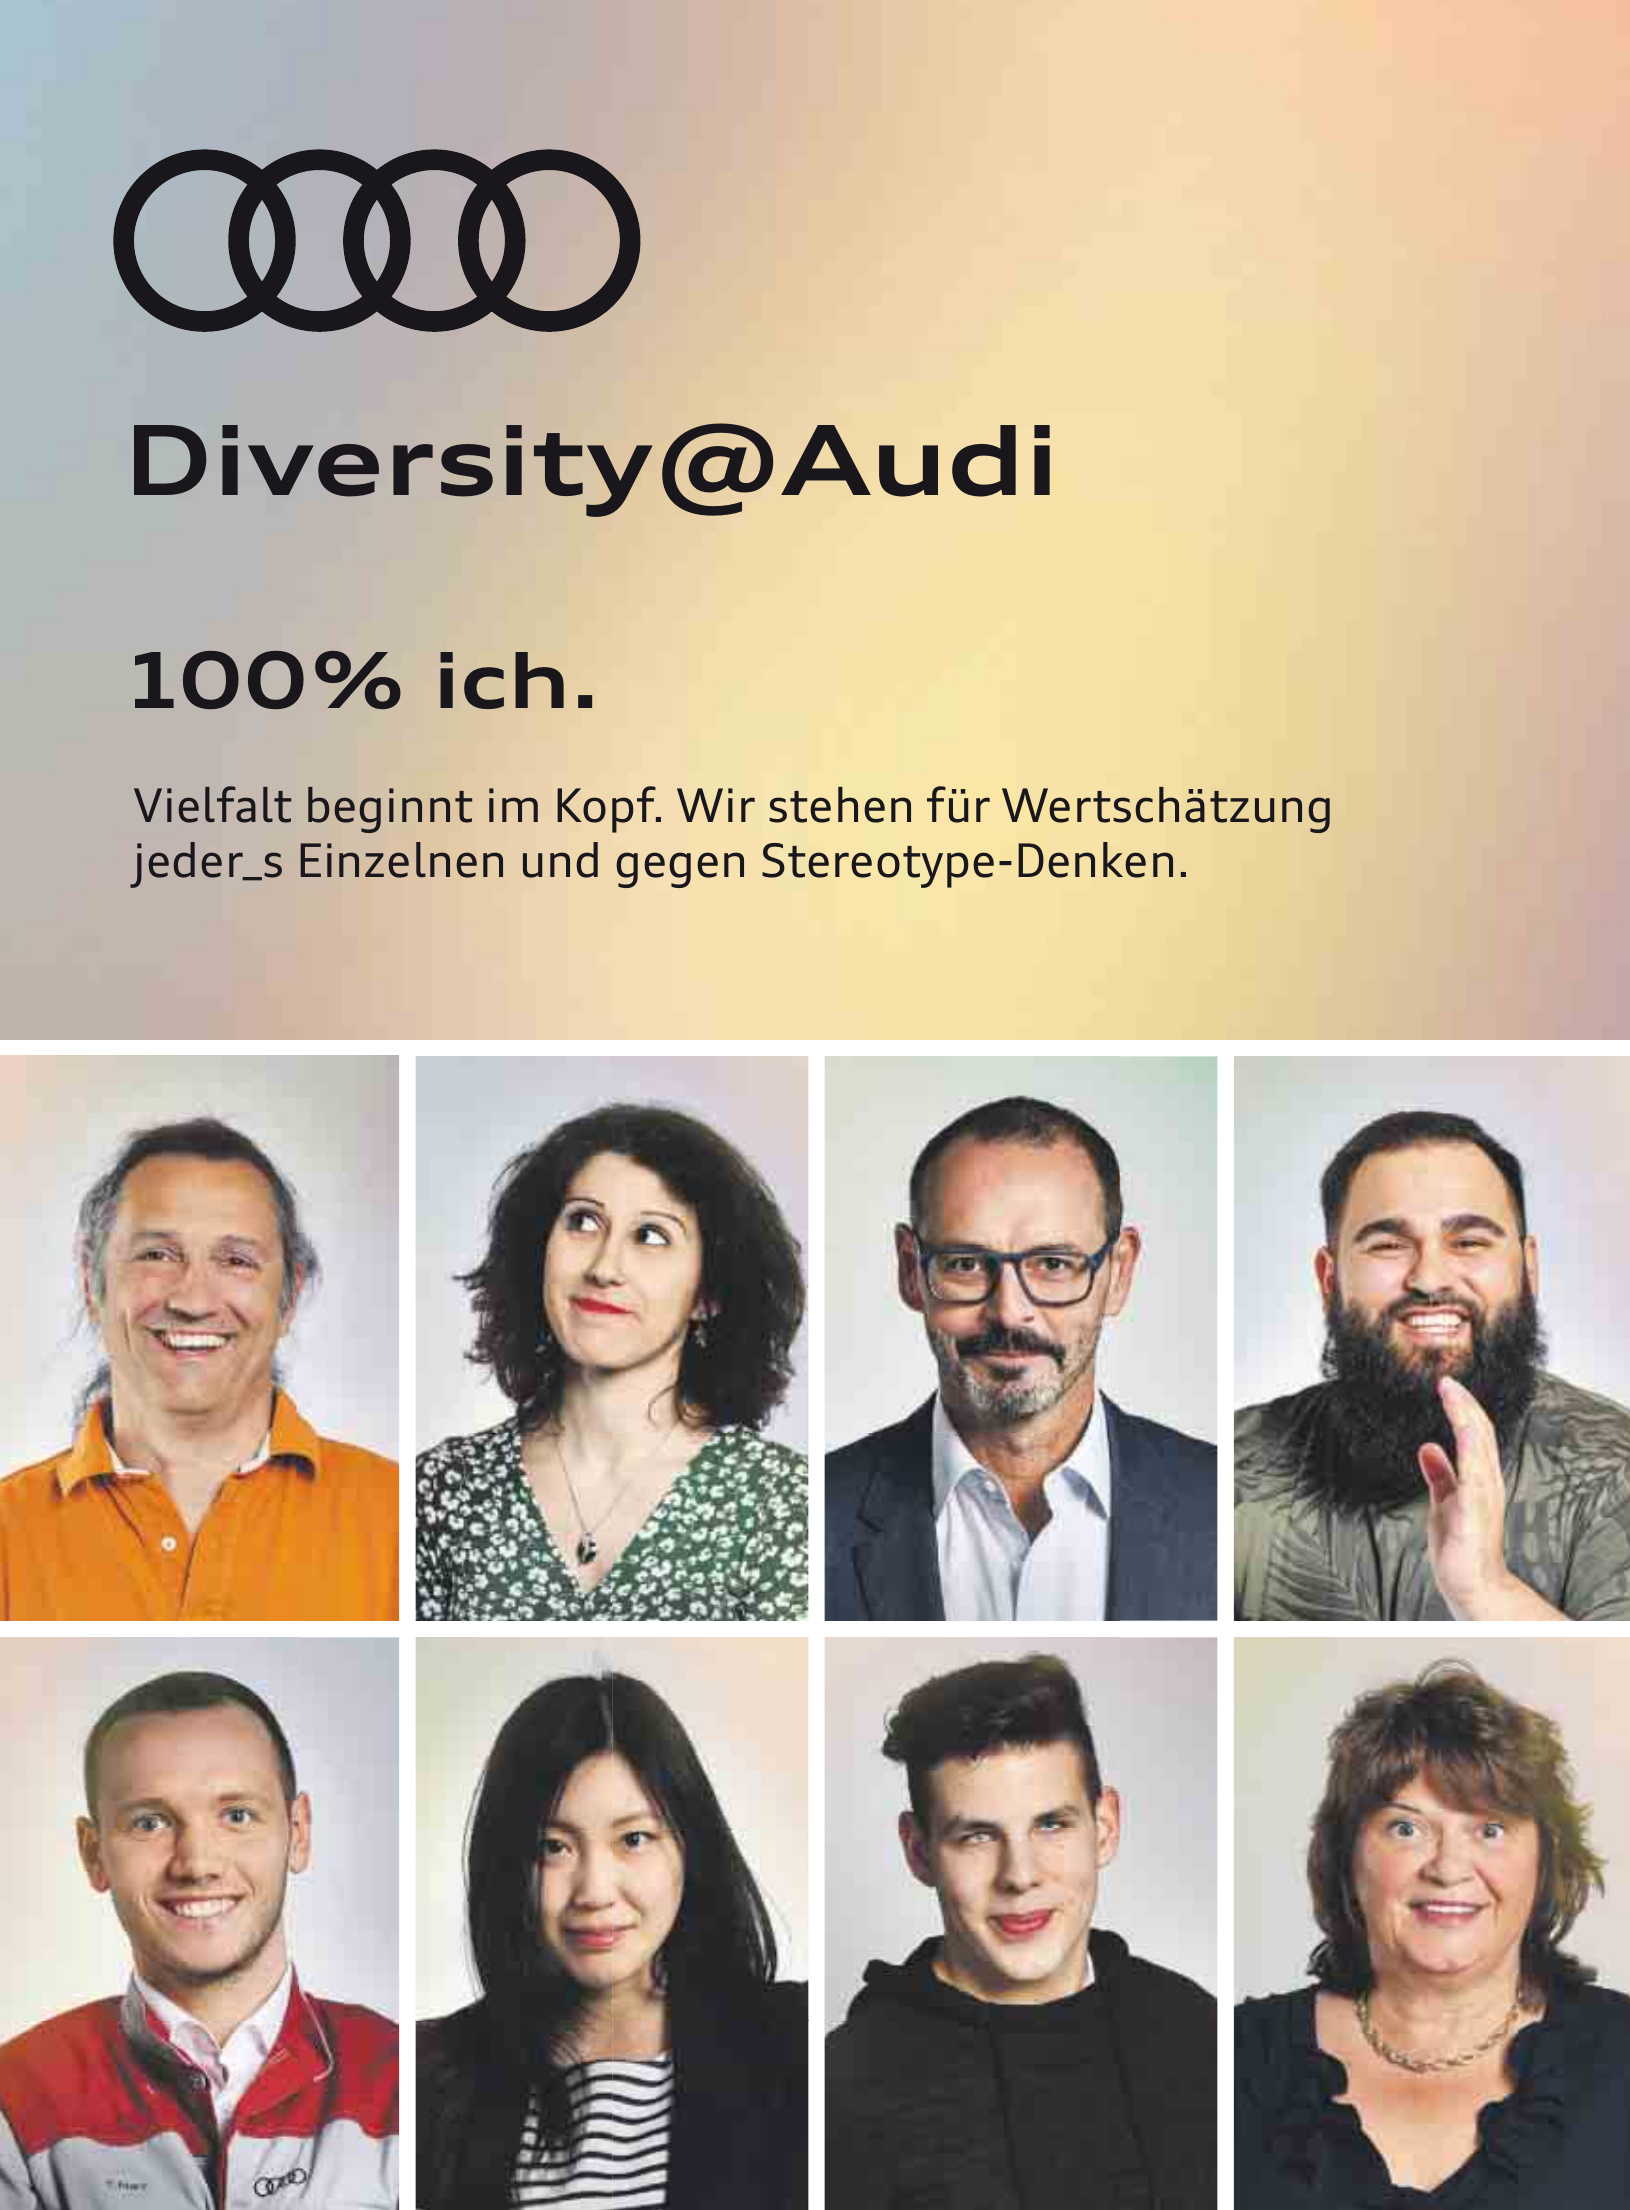 Diversity@Audi